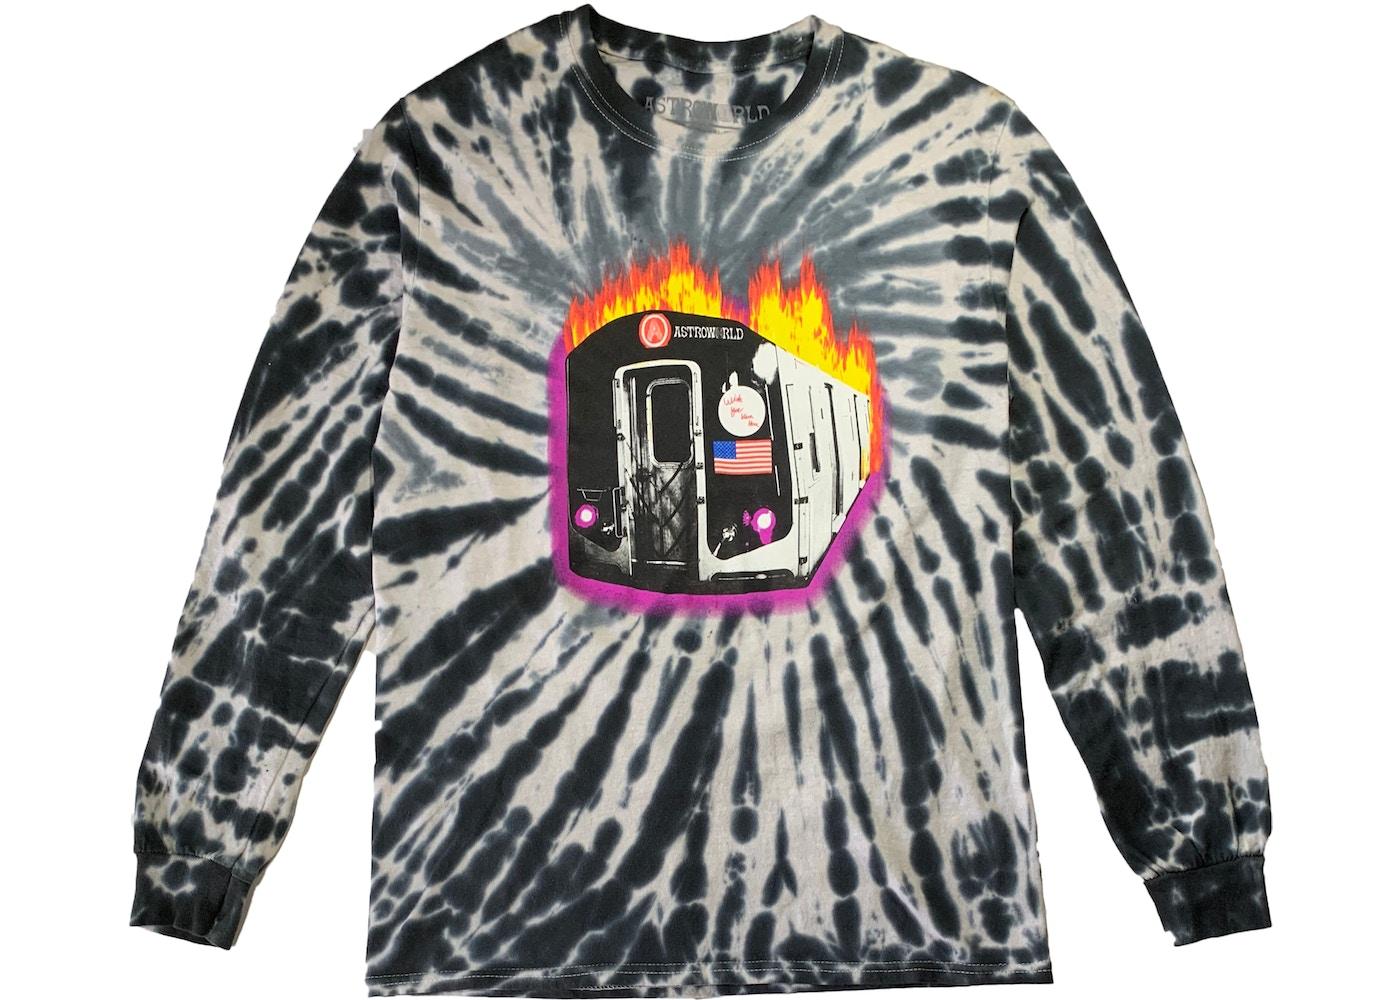 96743834 Travis Scott Astroworld Tour Burning Train Barclays L/S Tee Tie Dye ...